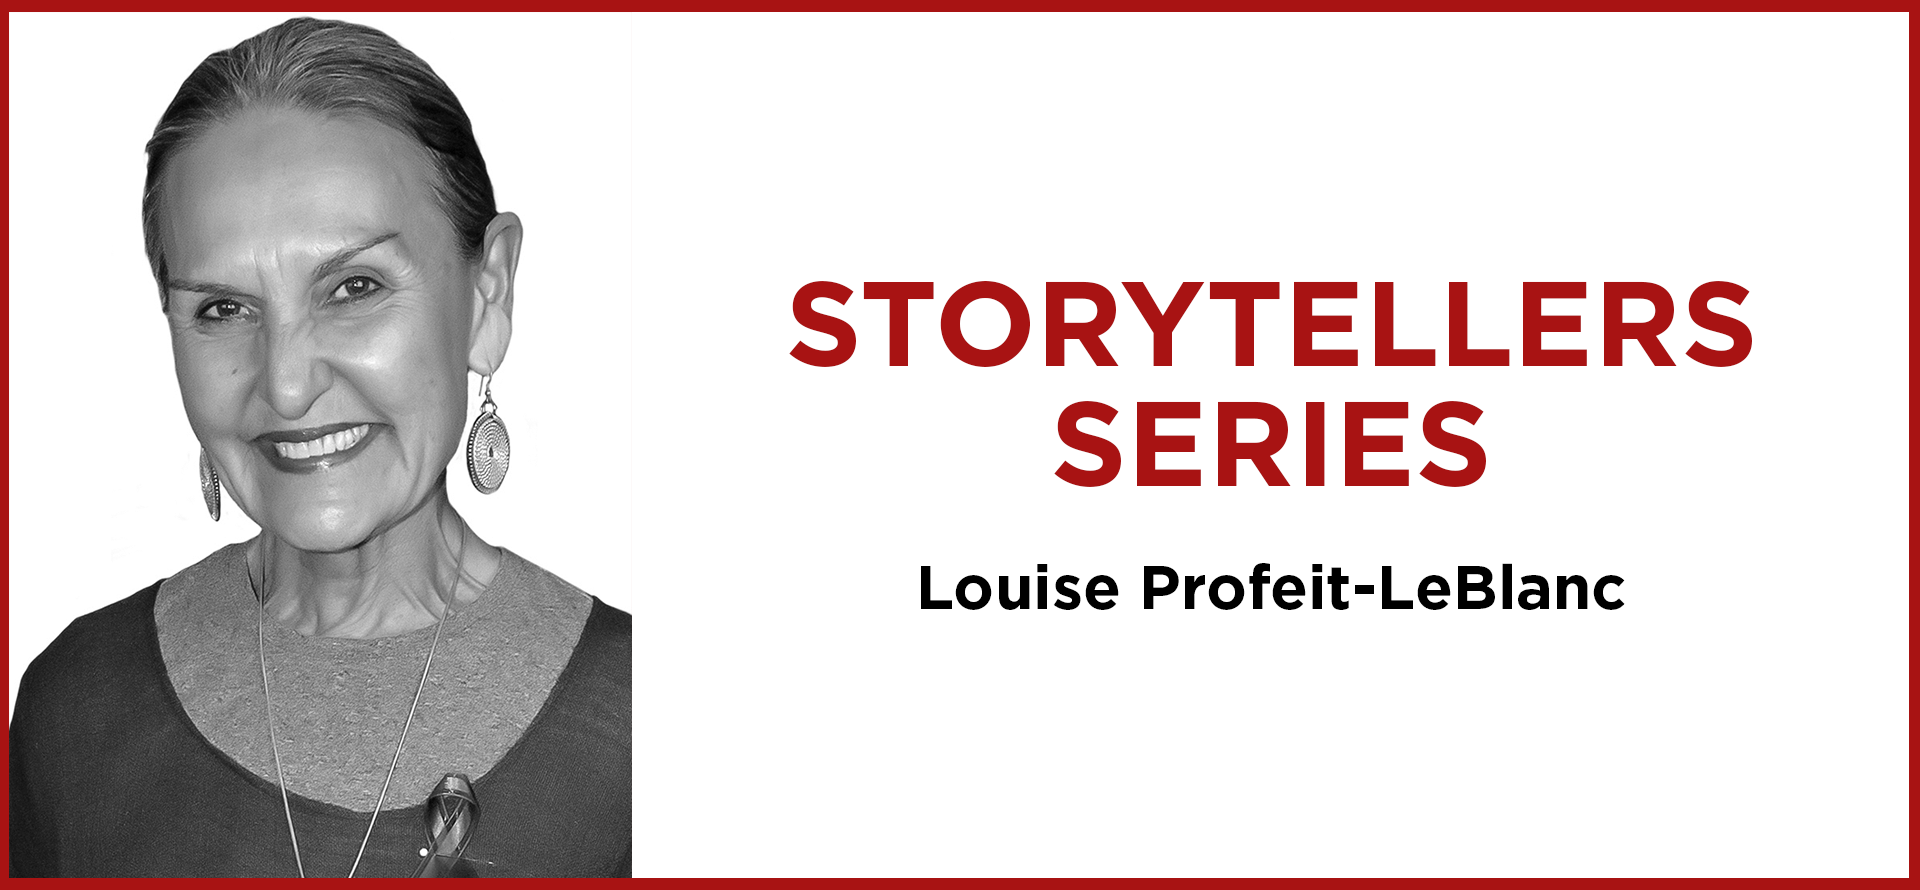 storytellers Louise Profeit-LeBlanc